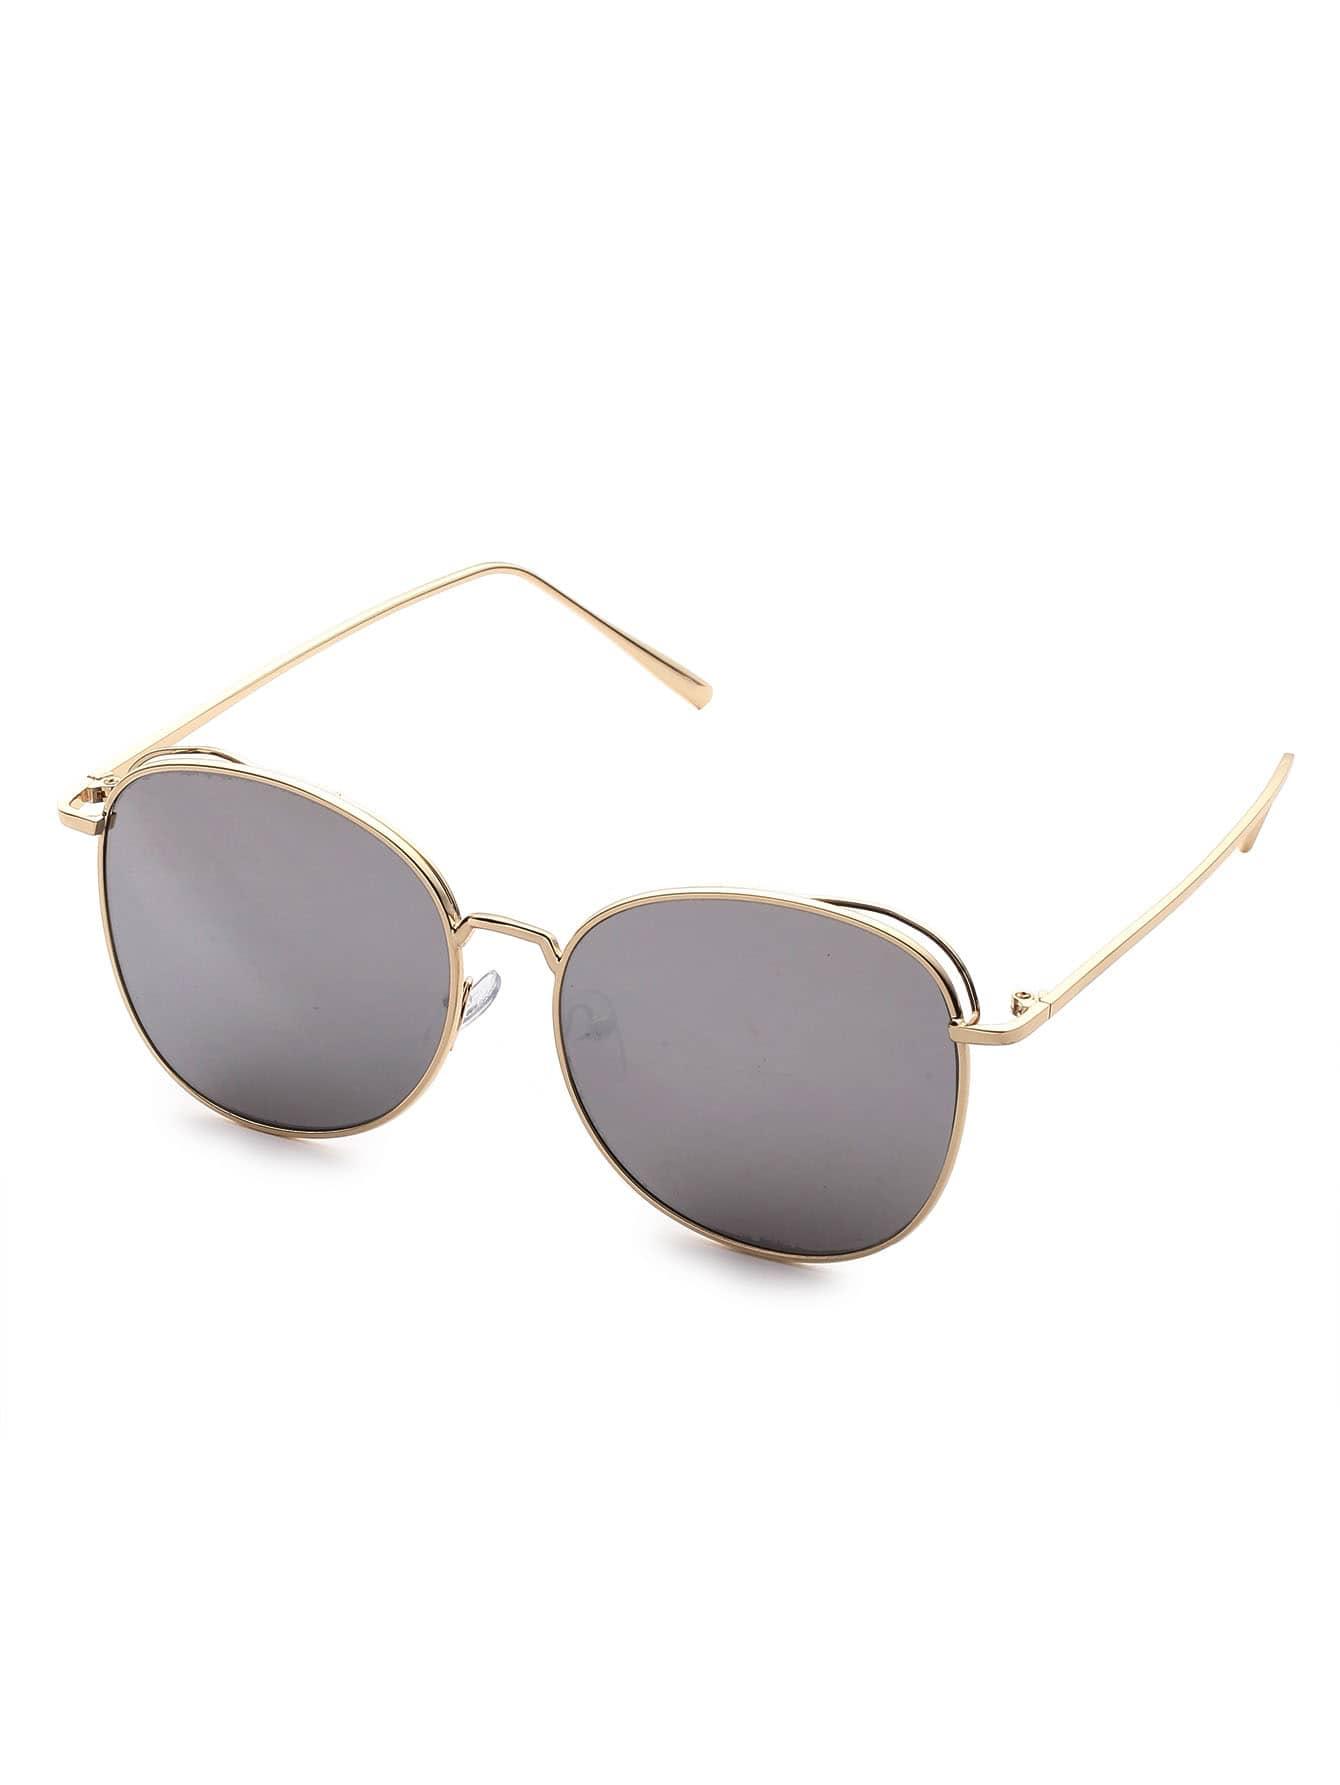 Gold Frame Grey Lens Sunglasses